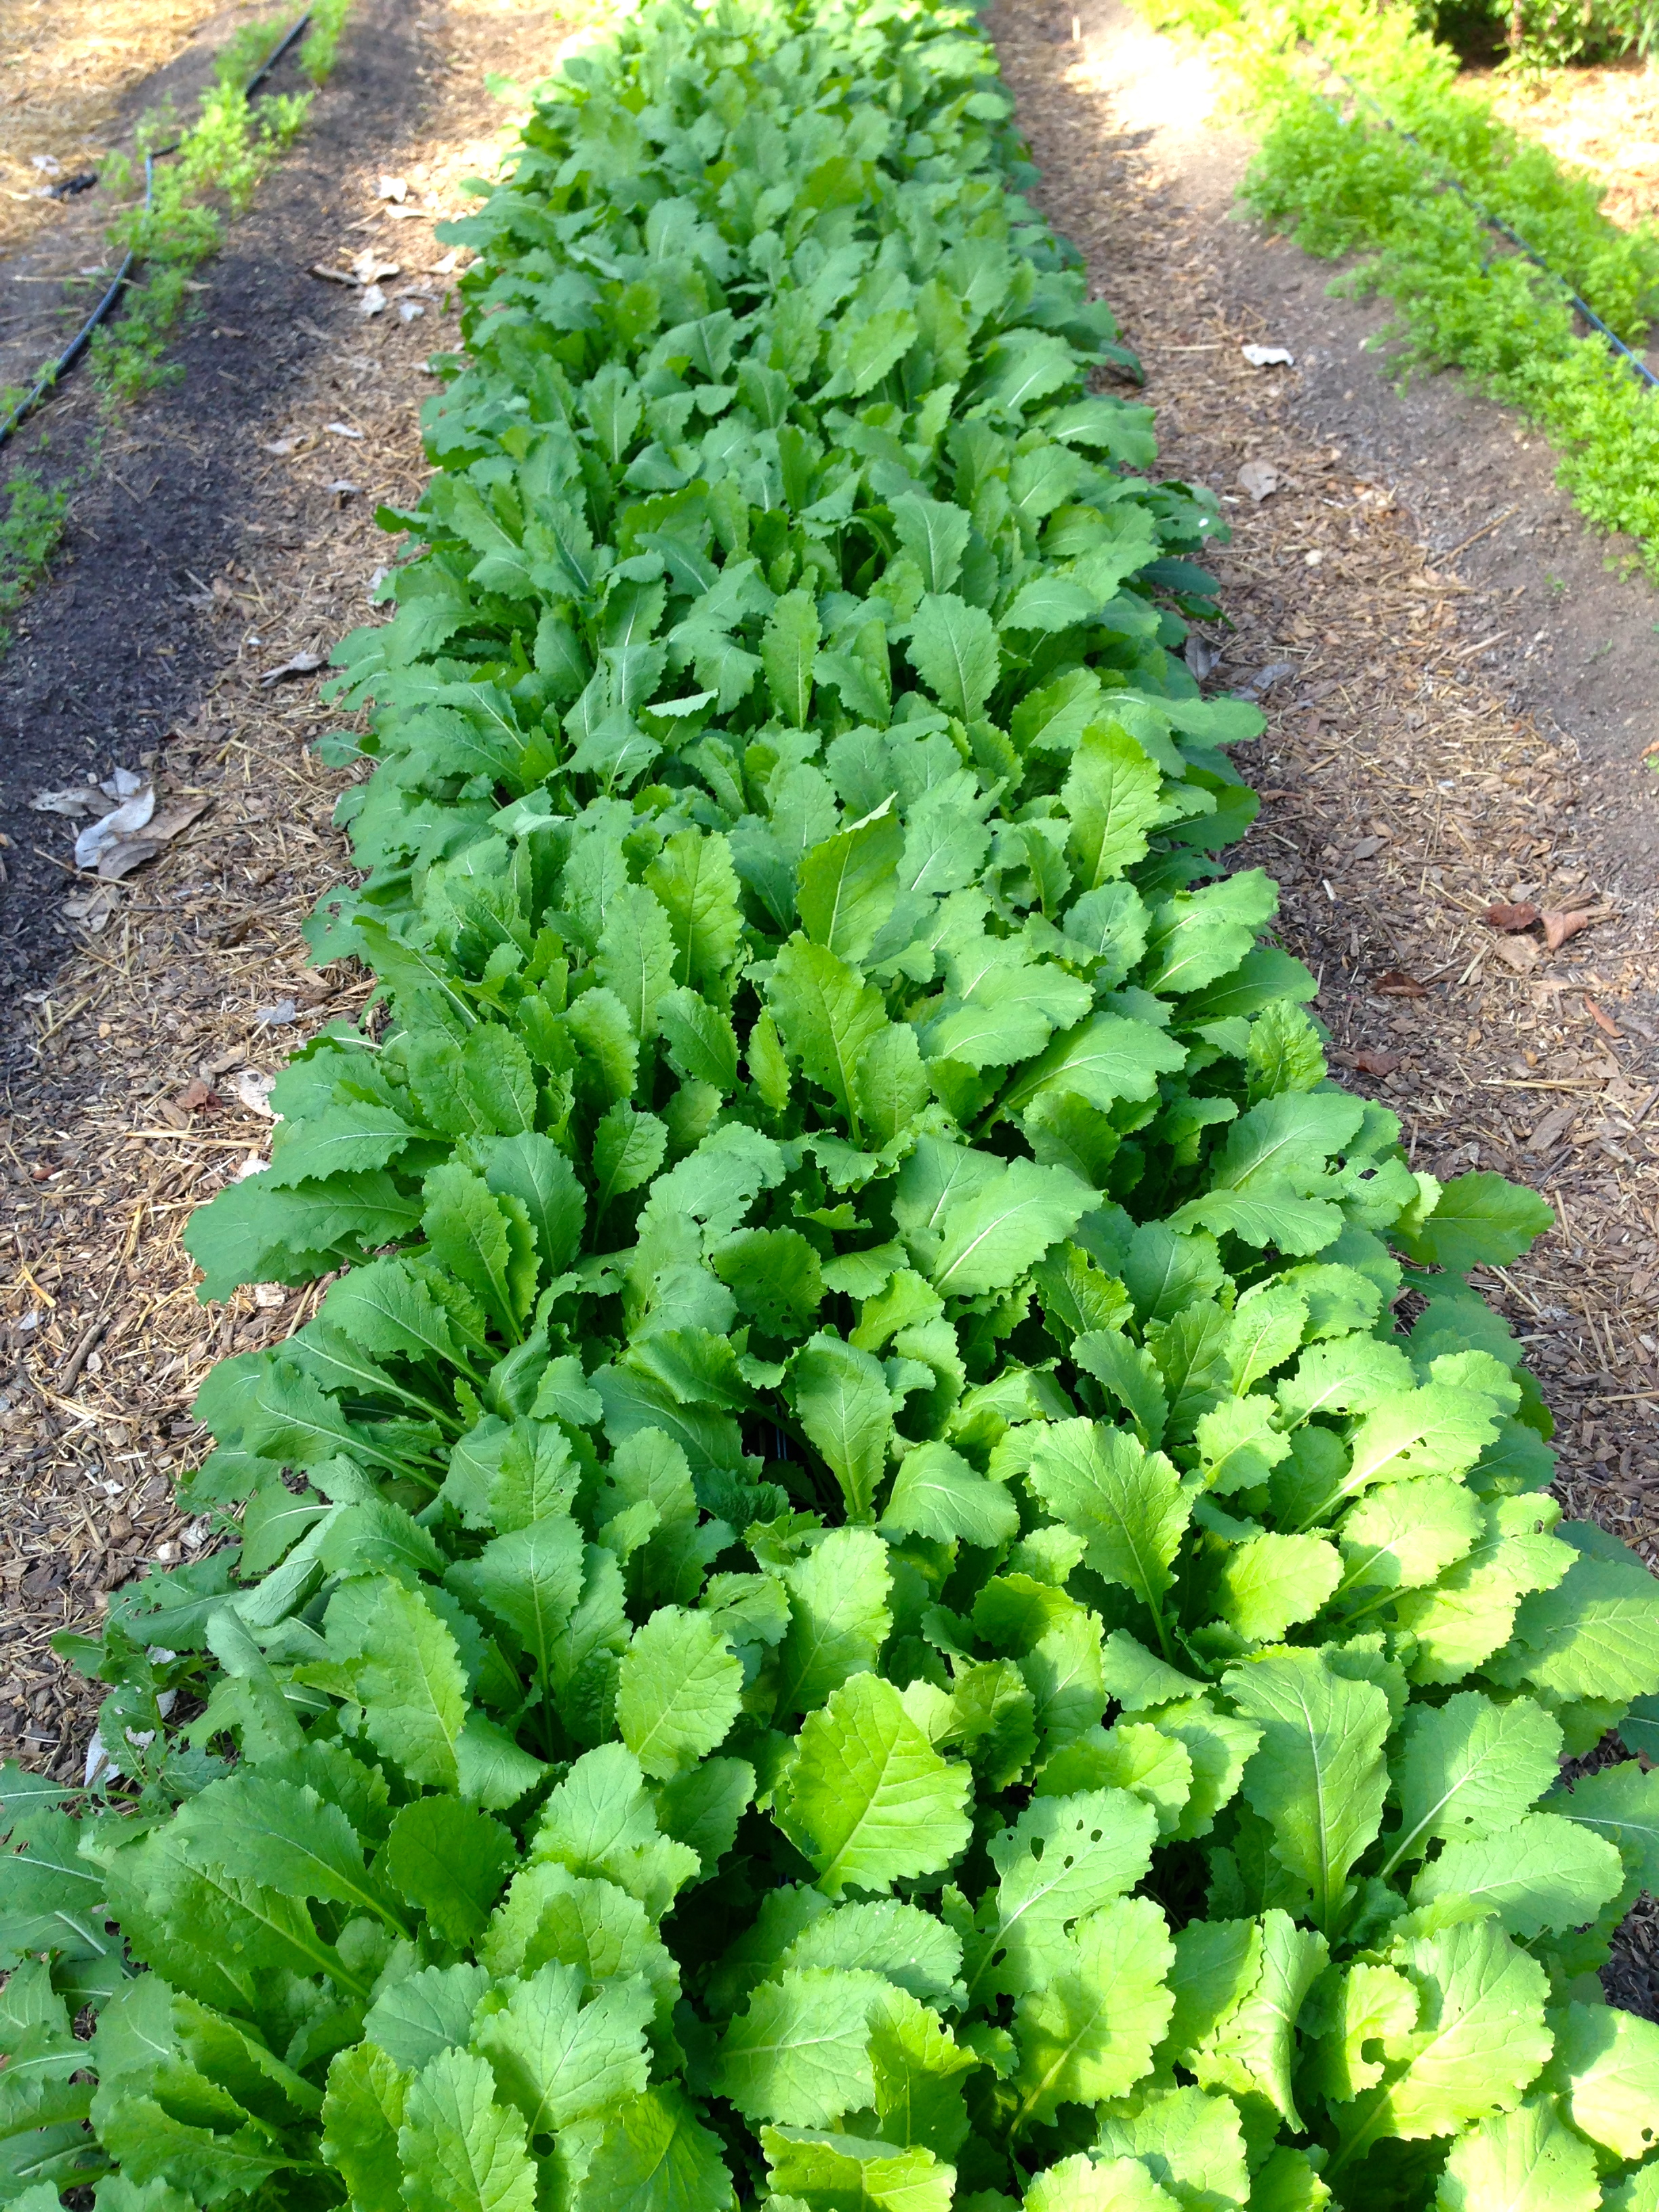 Beautiful, beautiful turnip greens with white sweet Hakuri Turnips forming underneath them.